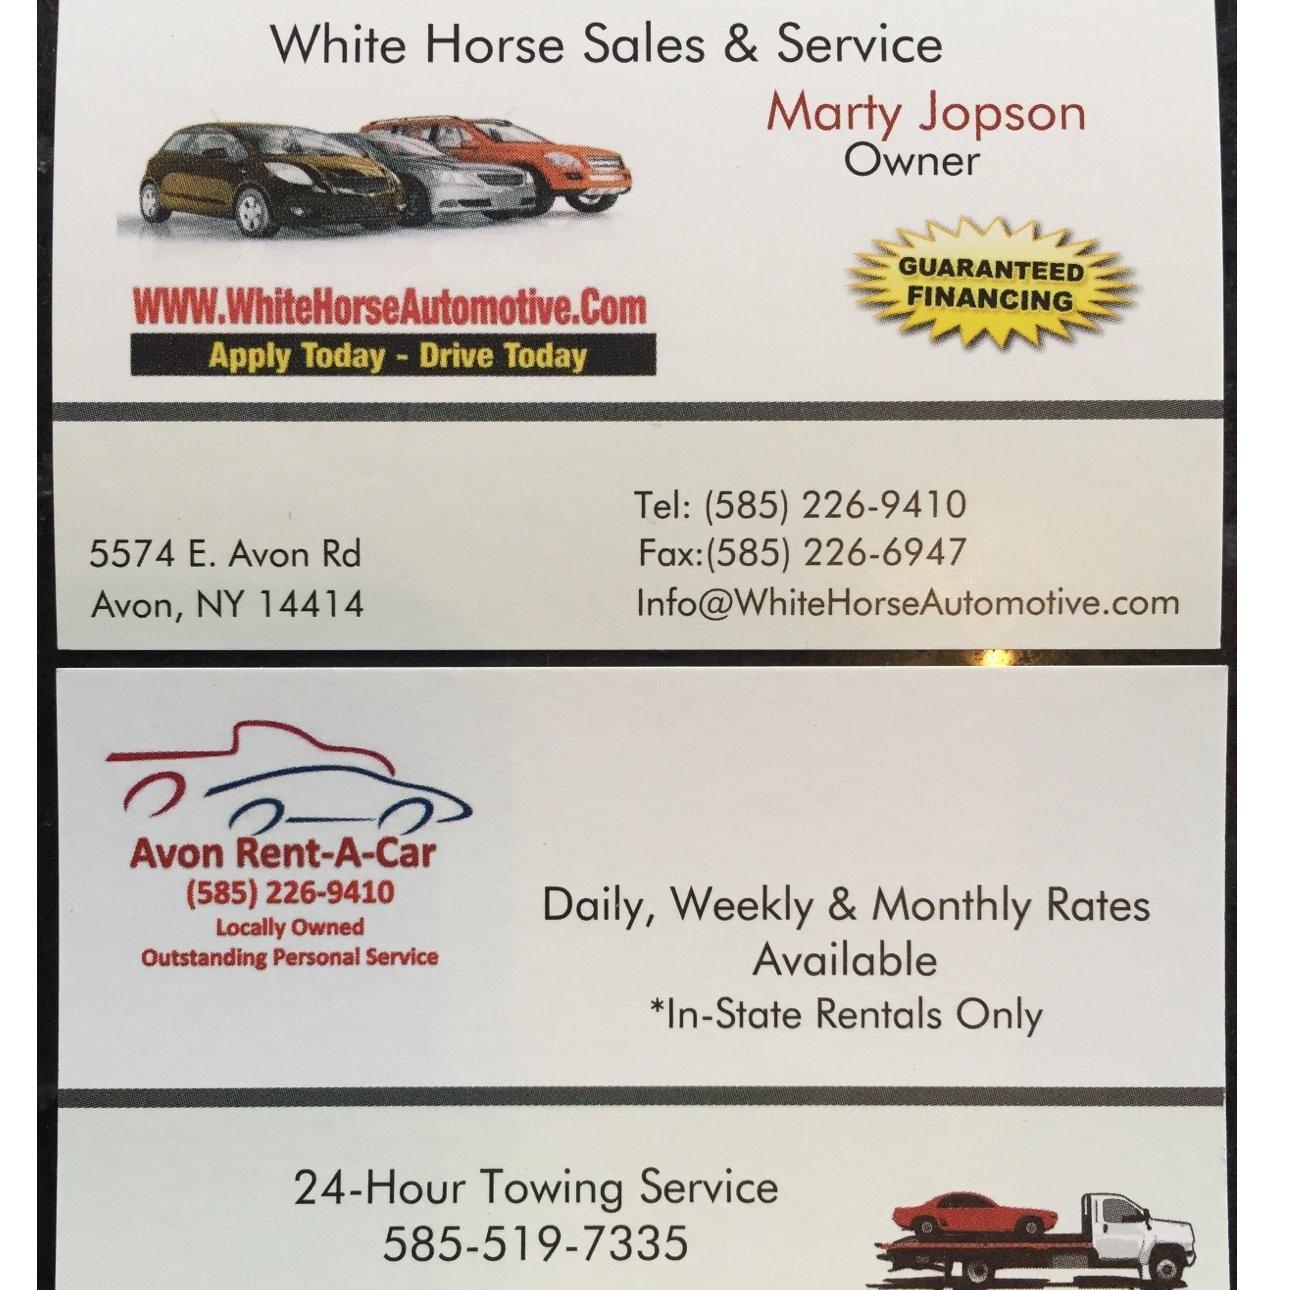 WhiteHorse Auto Sales & Service Inc